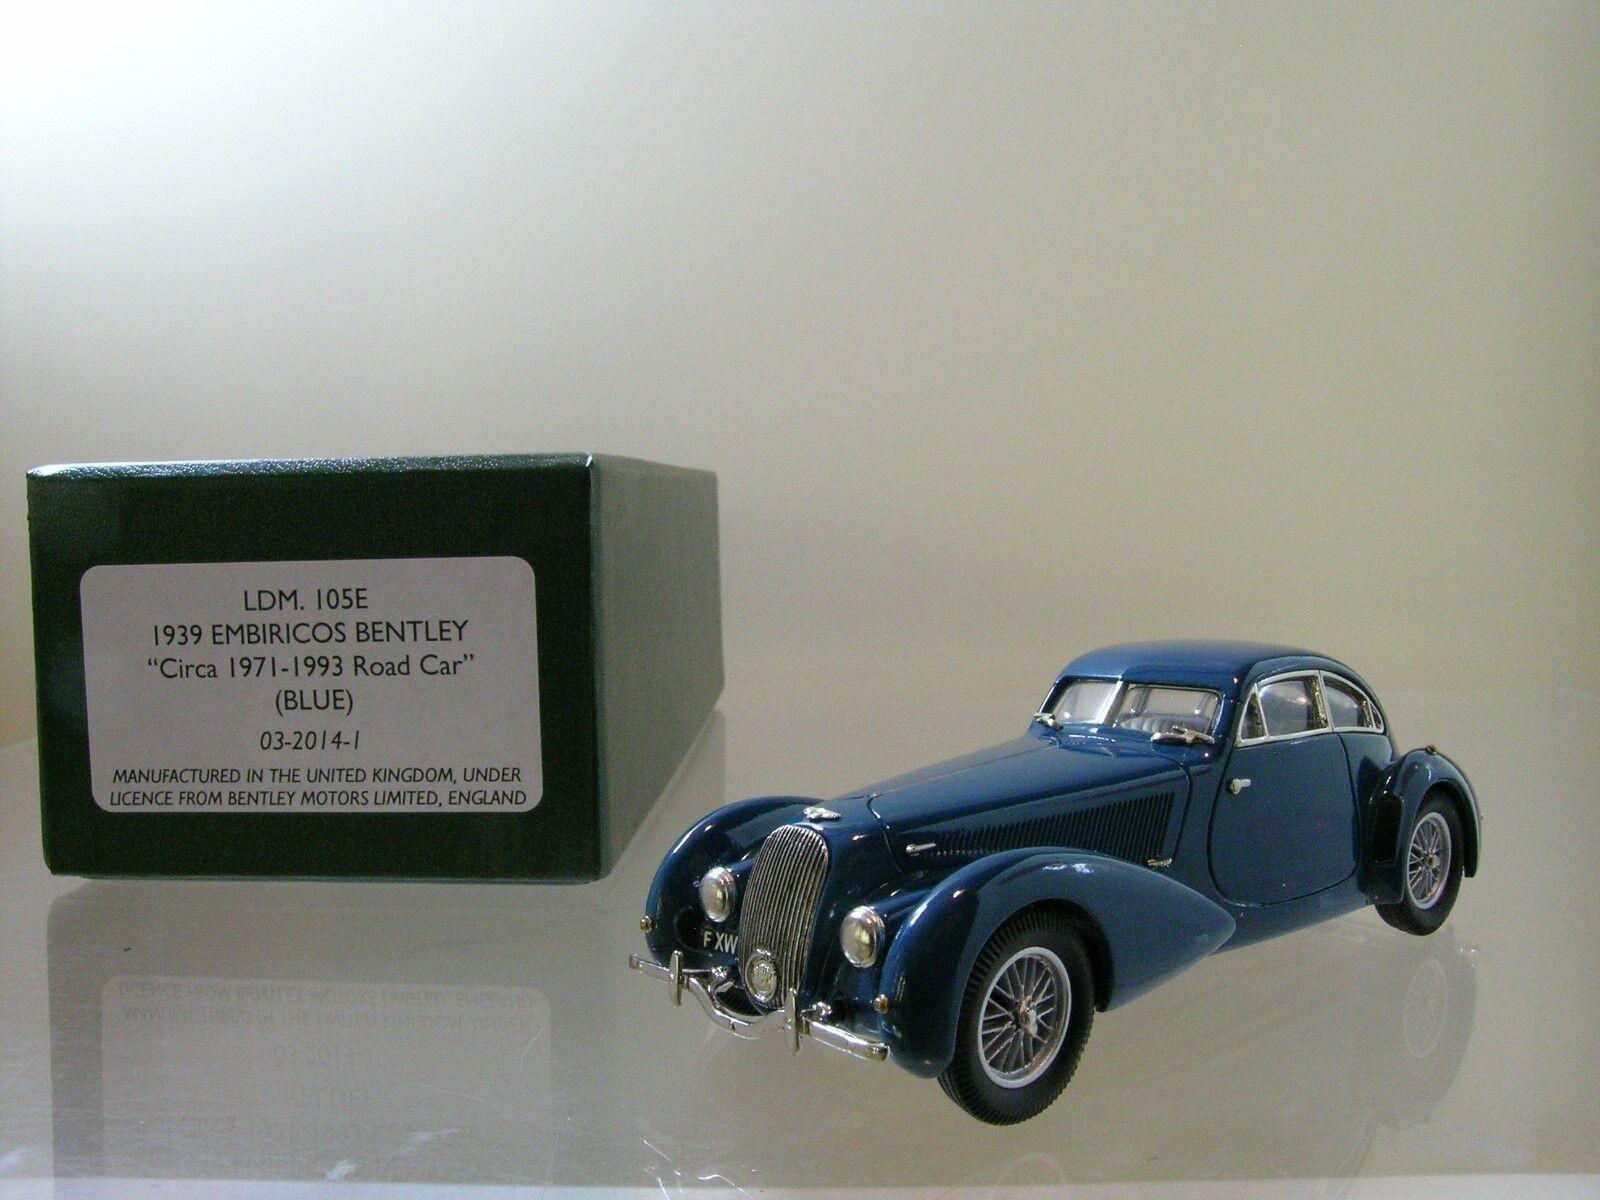 LANSDOWNE MODELS LDM105E BENTLEY EMBRICOS ROADCAR 1939 blu HANDBUILT + BOX 1 43